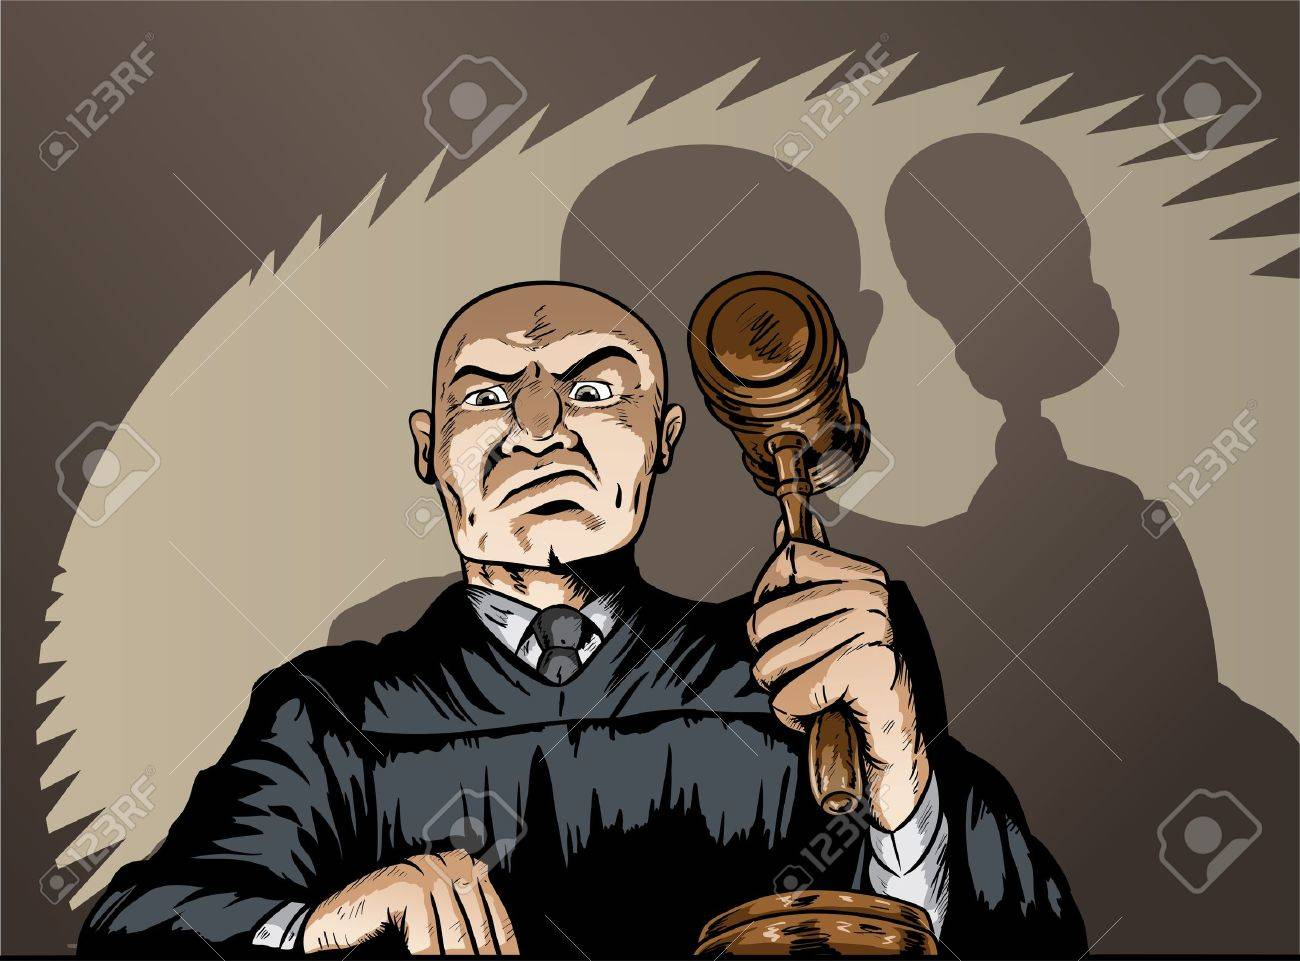 Stern Judge - 13617994